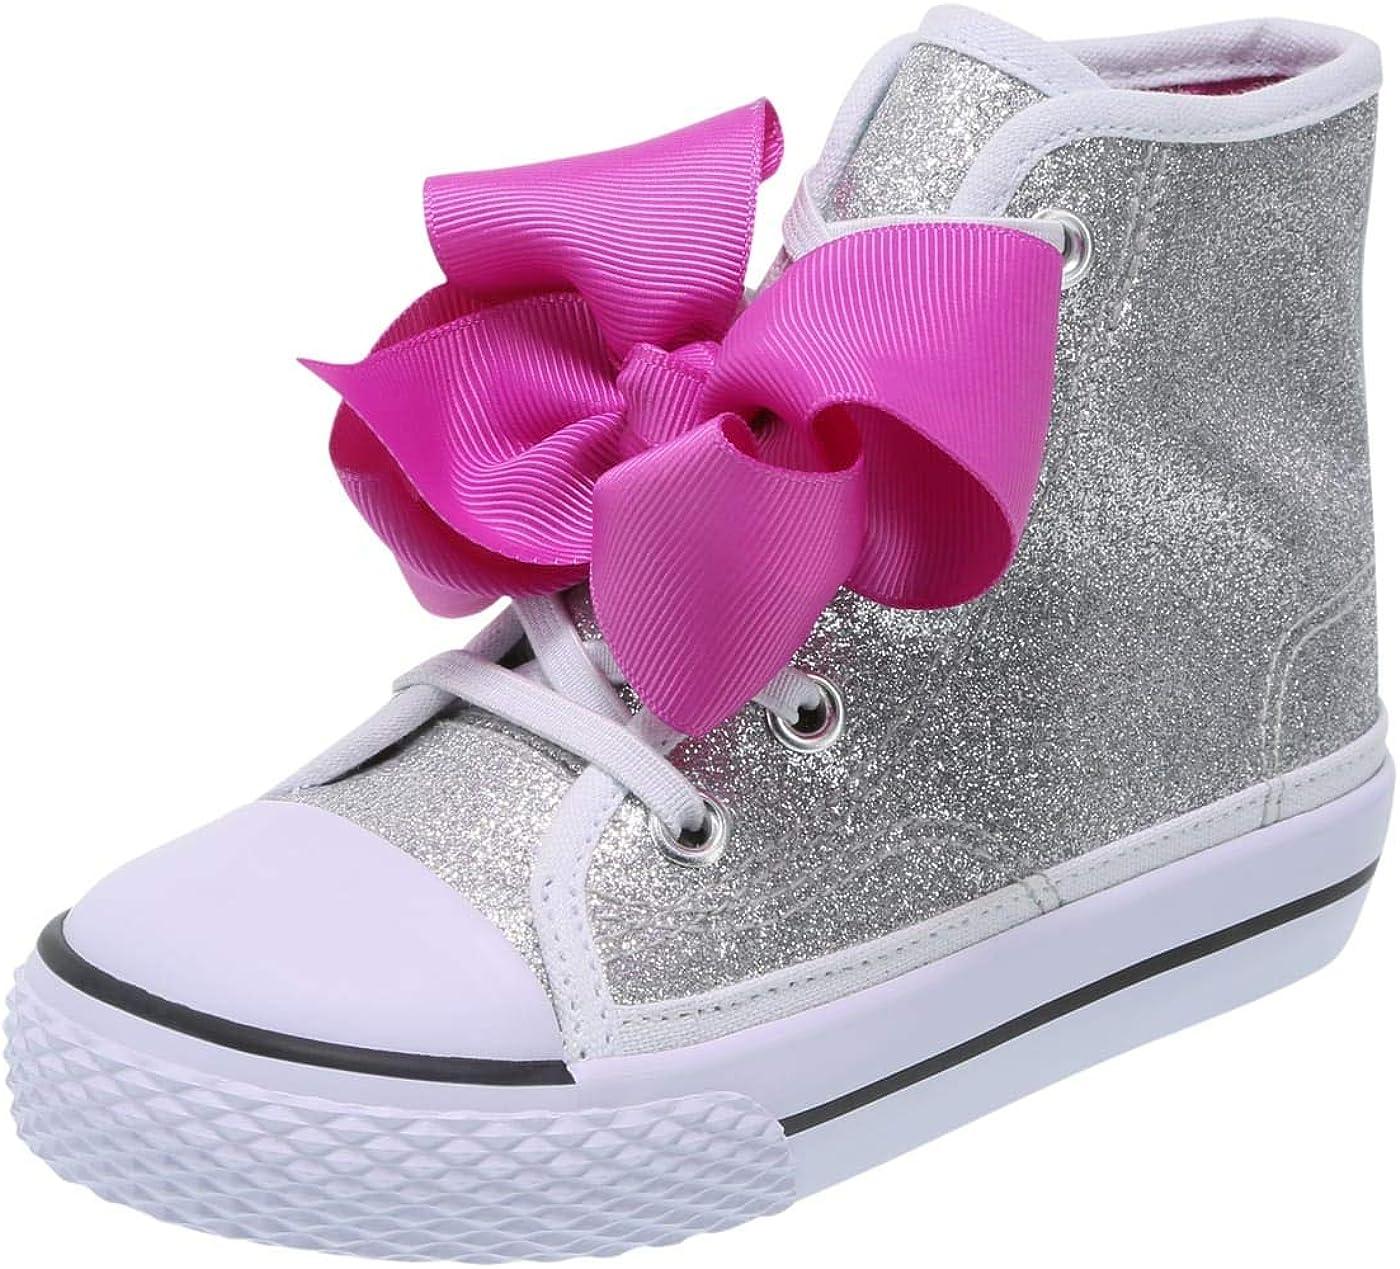 Nickelodeon Shoes JoJo Siwa Girls